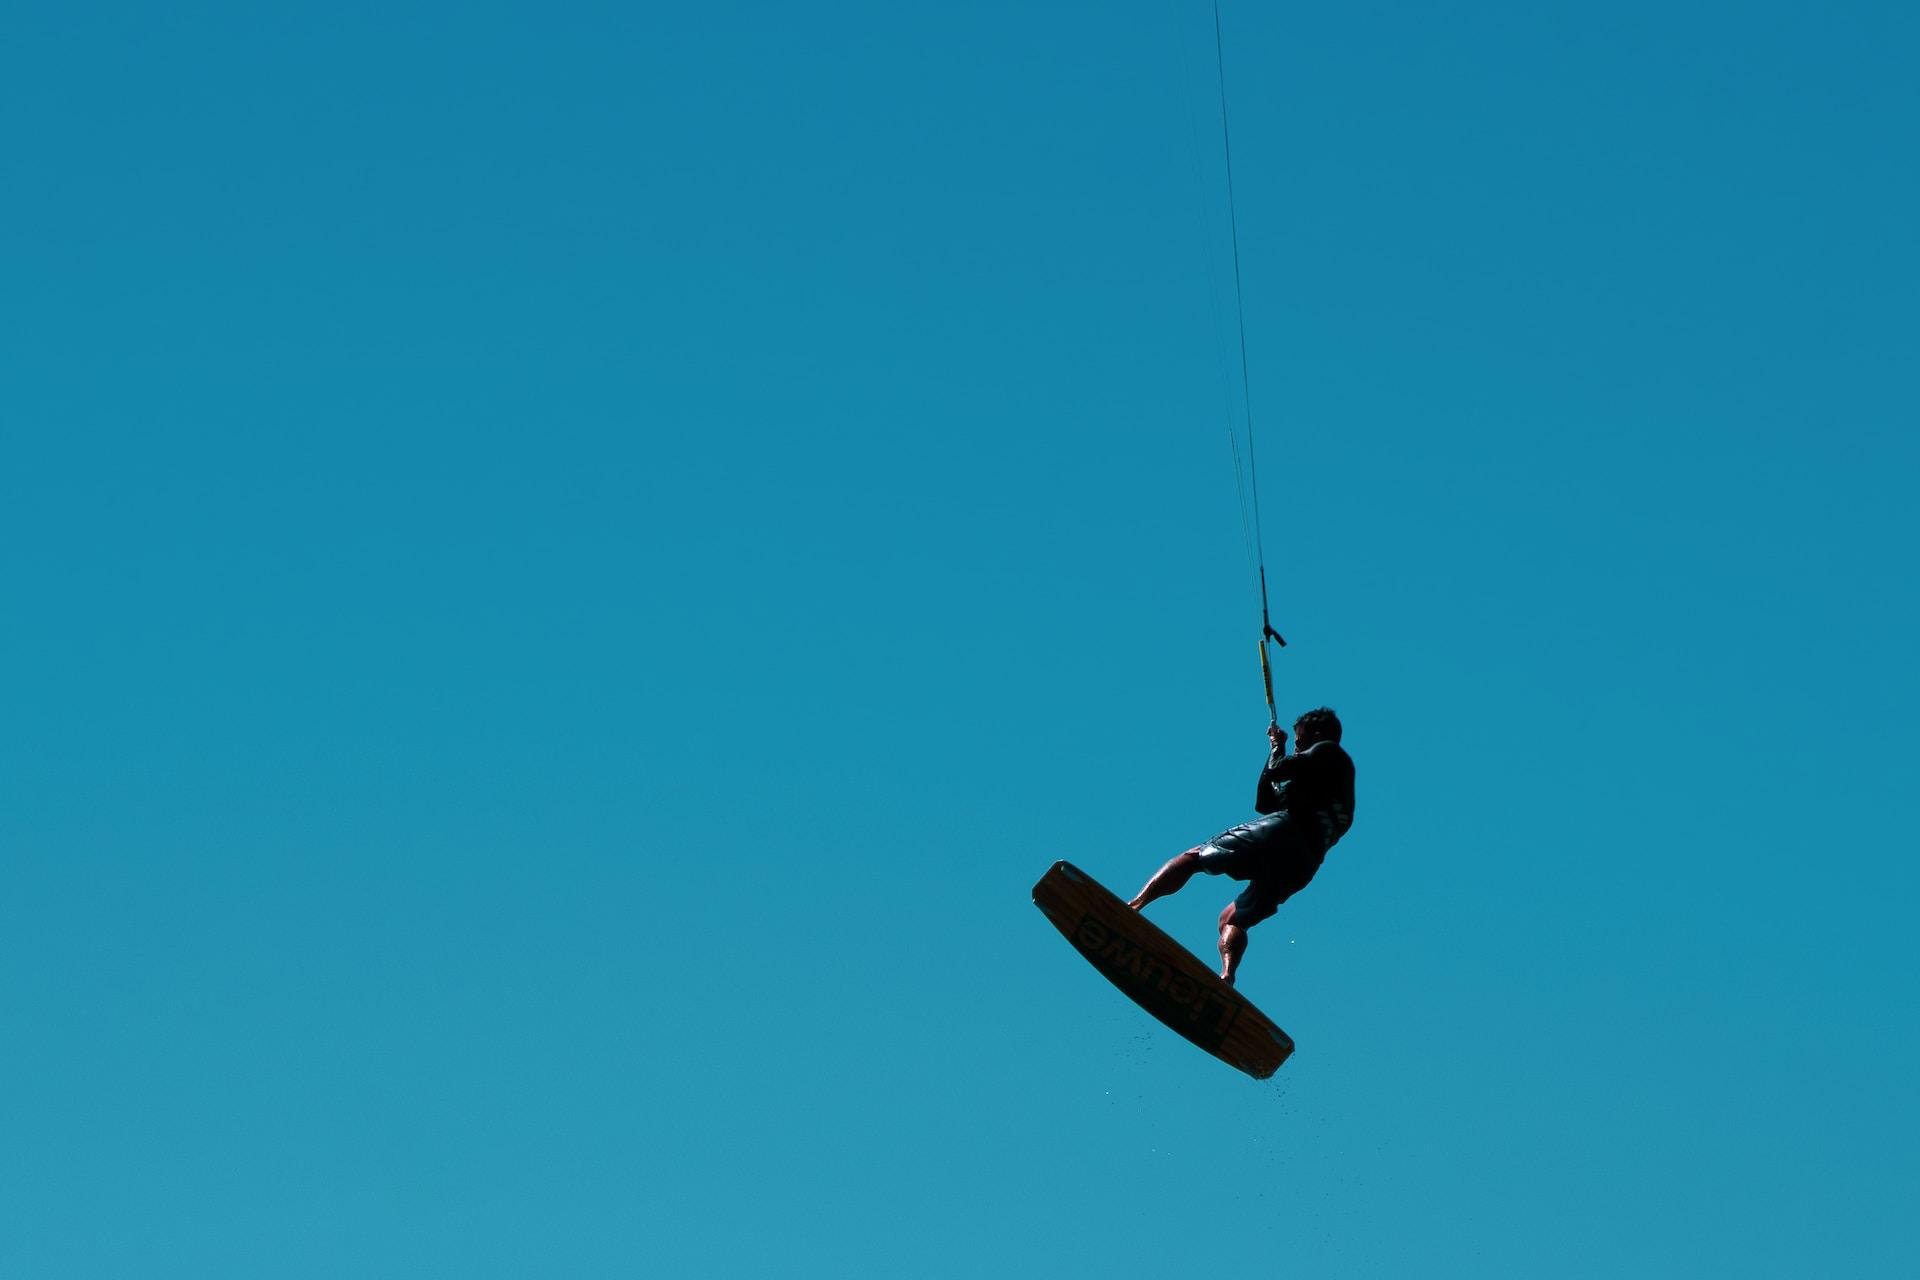 man in black jacket and black pants riding on brown skateboard under blue sky during daytime